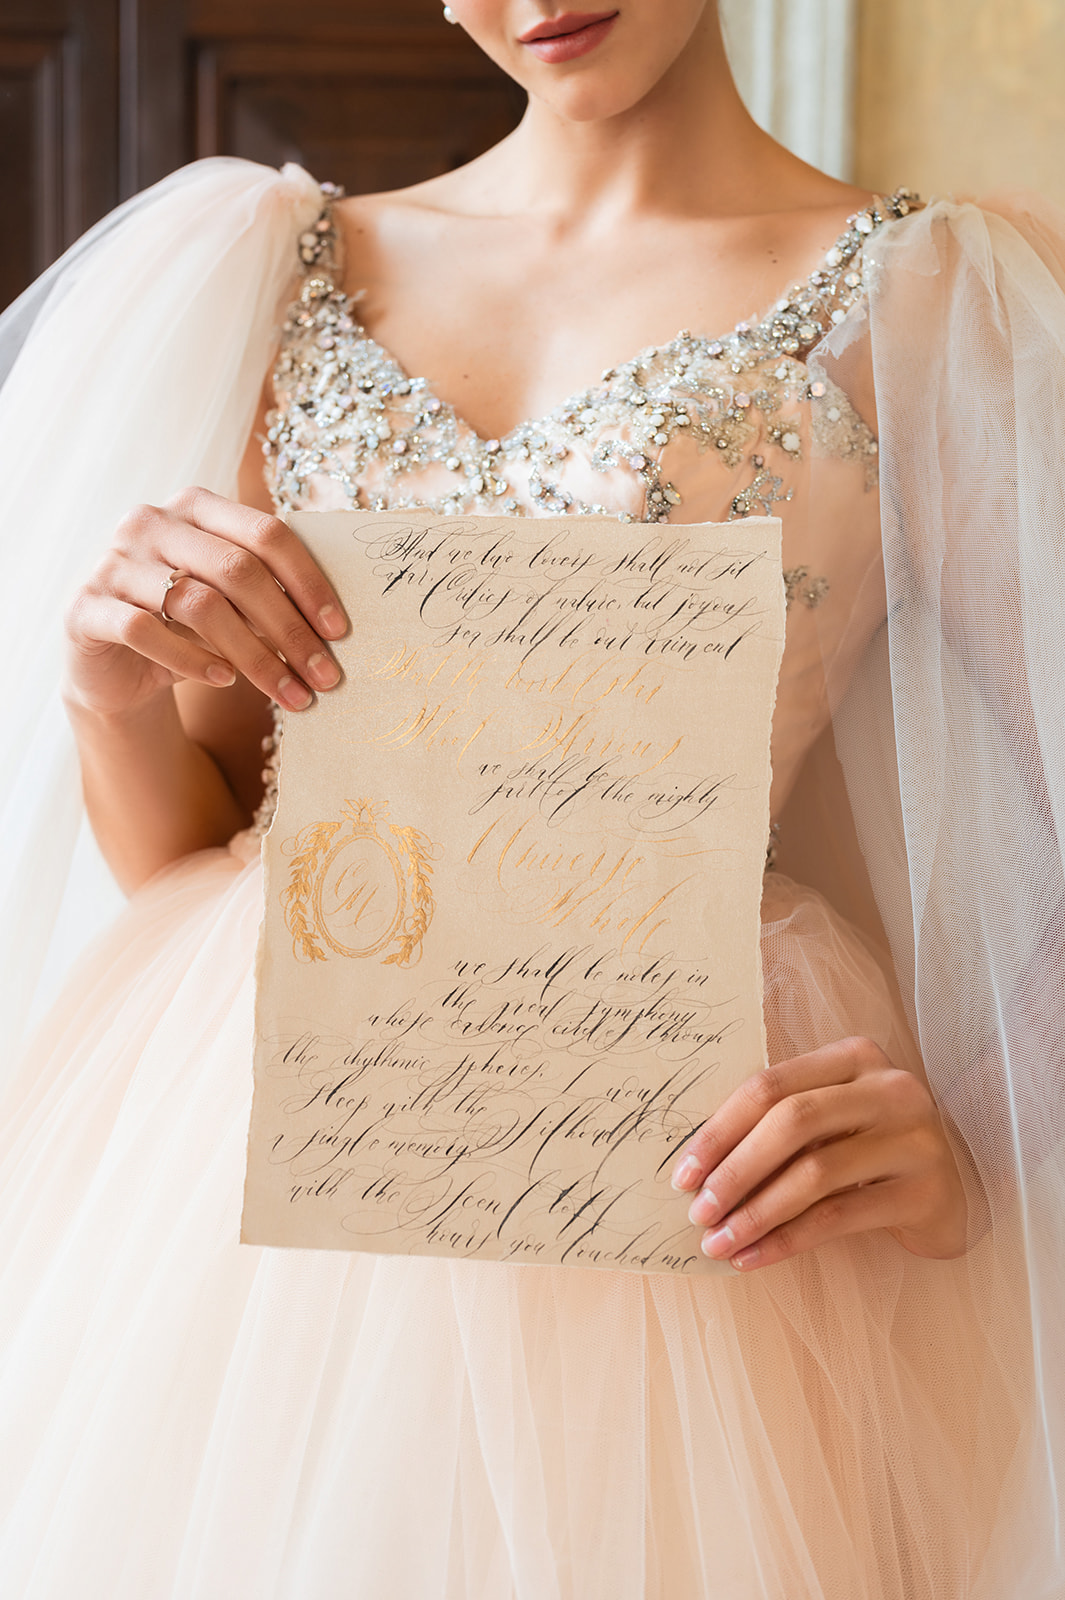 Luxury hand made, custom designed wedding vows for a luxury wedding at Villa Balbiano